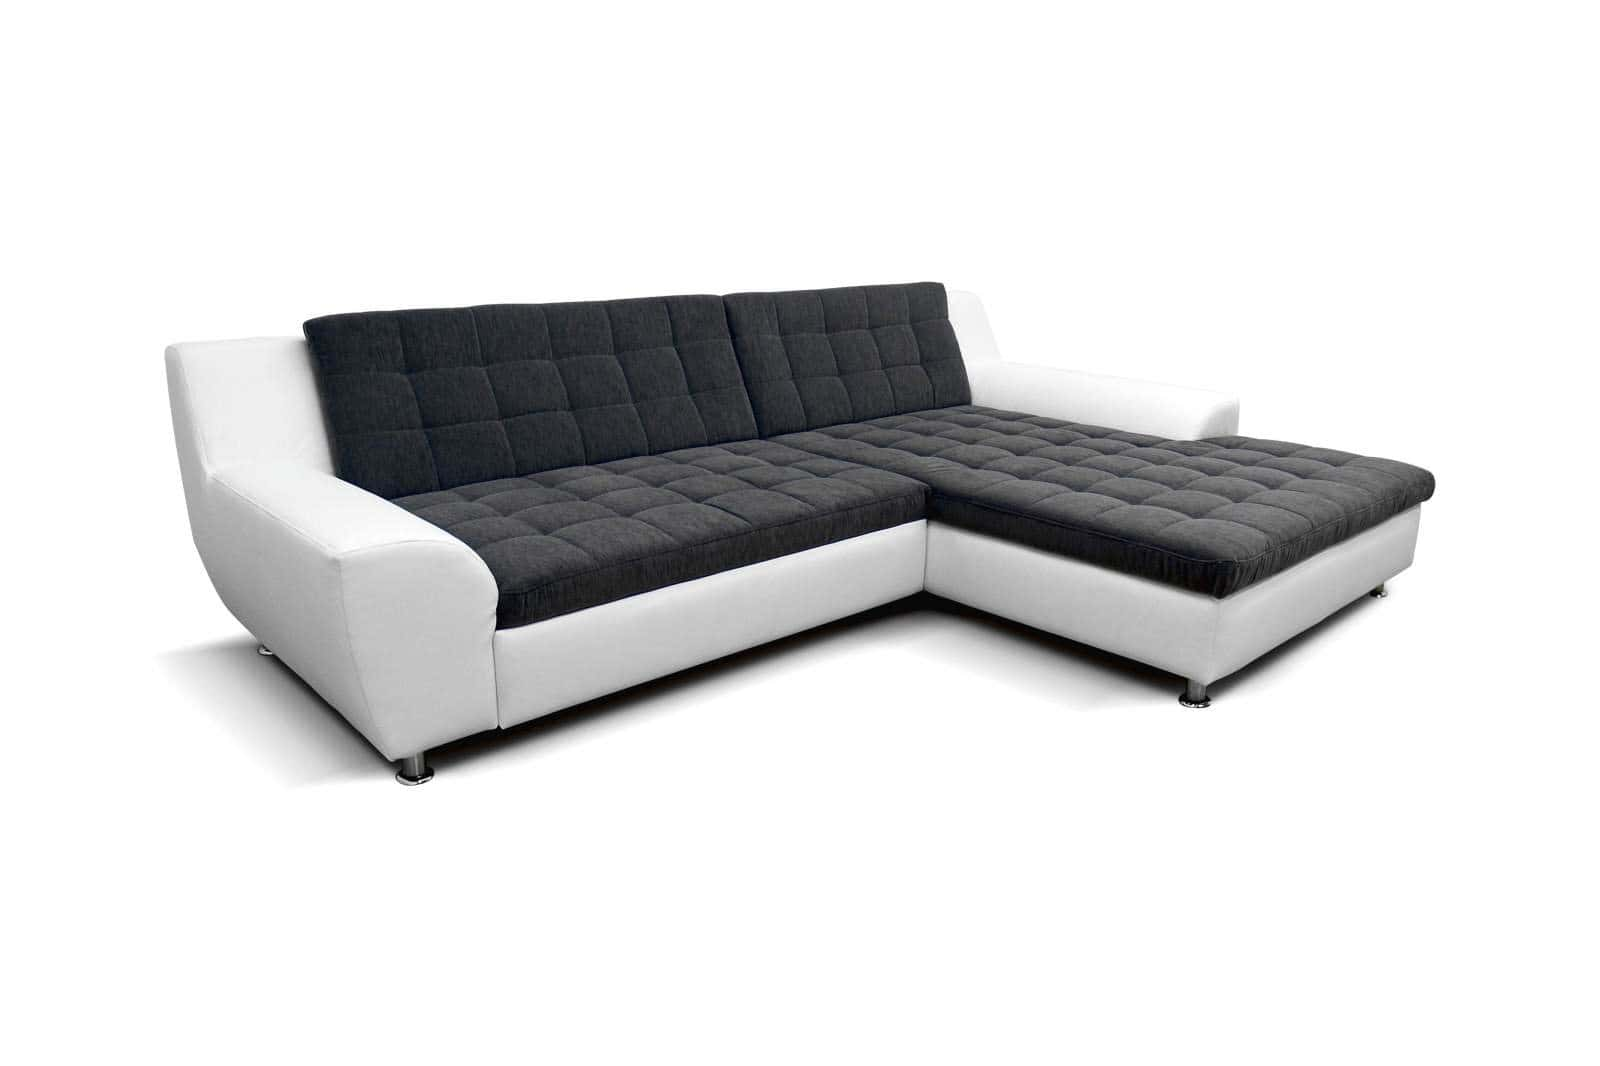 polsterecke morton wei dunkelgrau recamiere rechts m bel24. Black Bedroom Furniture Sets. Home Design Ideas